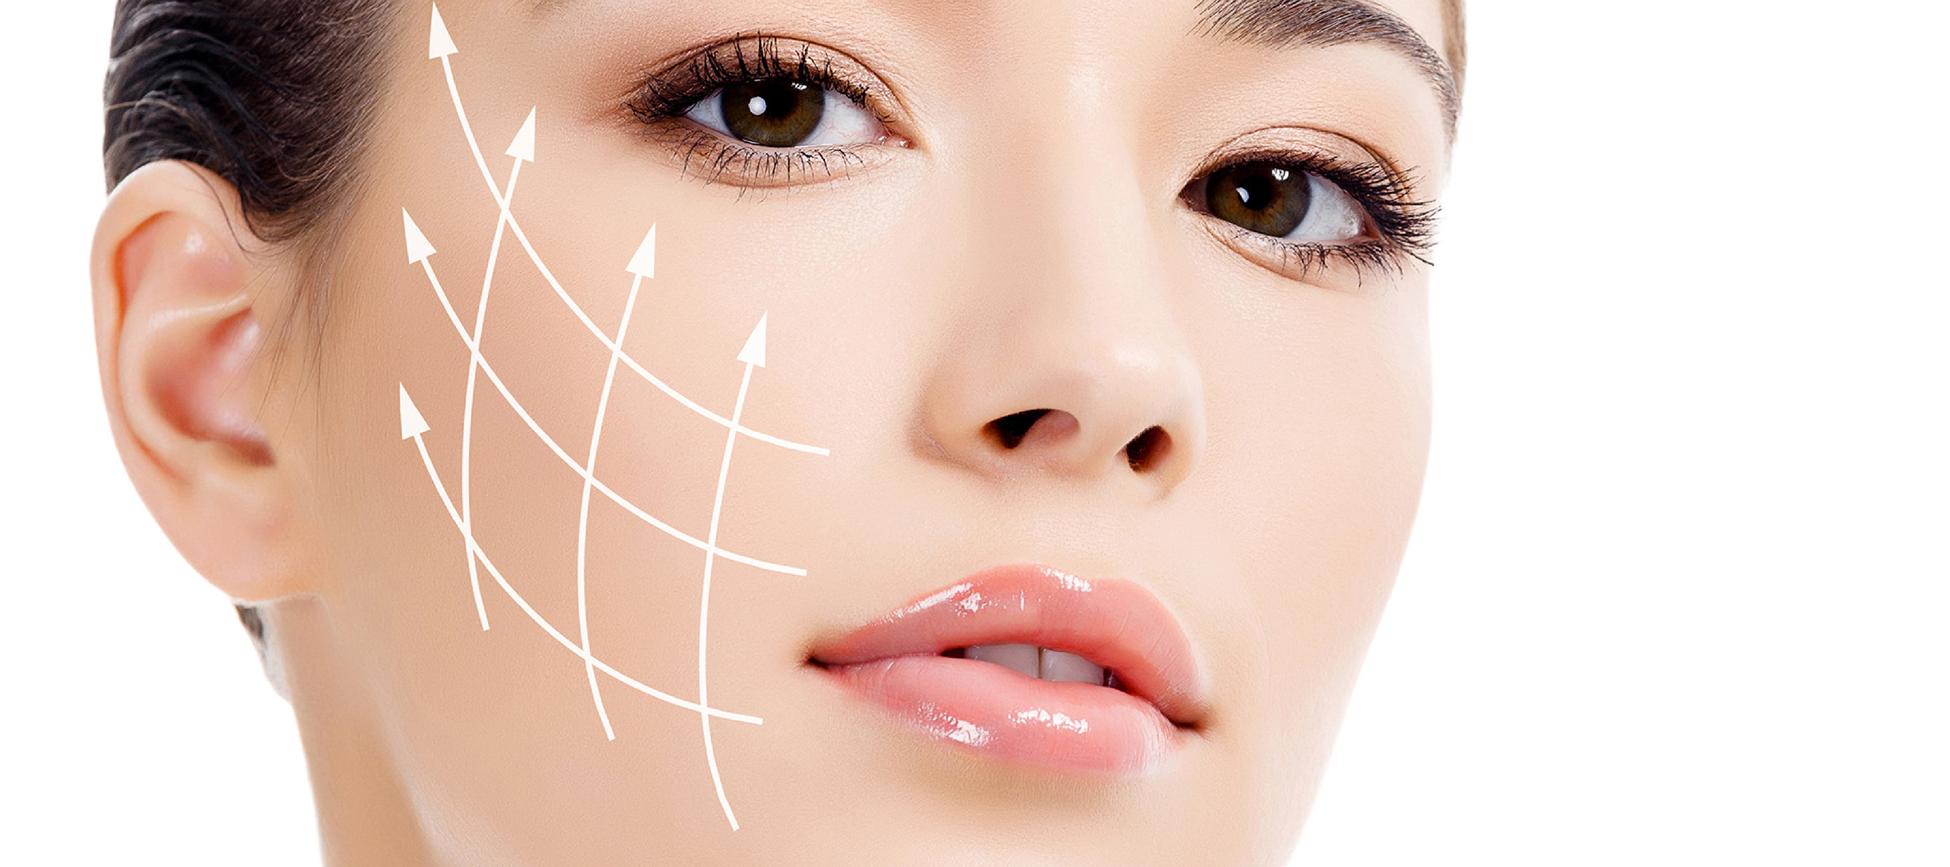 face lifting treatment